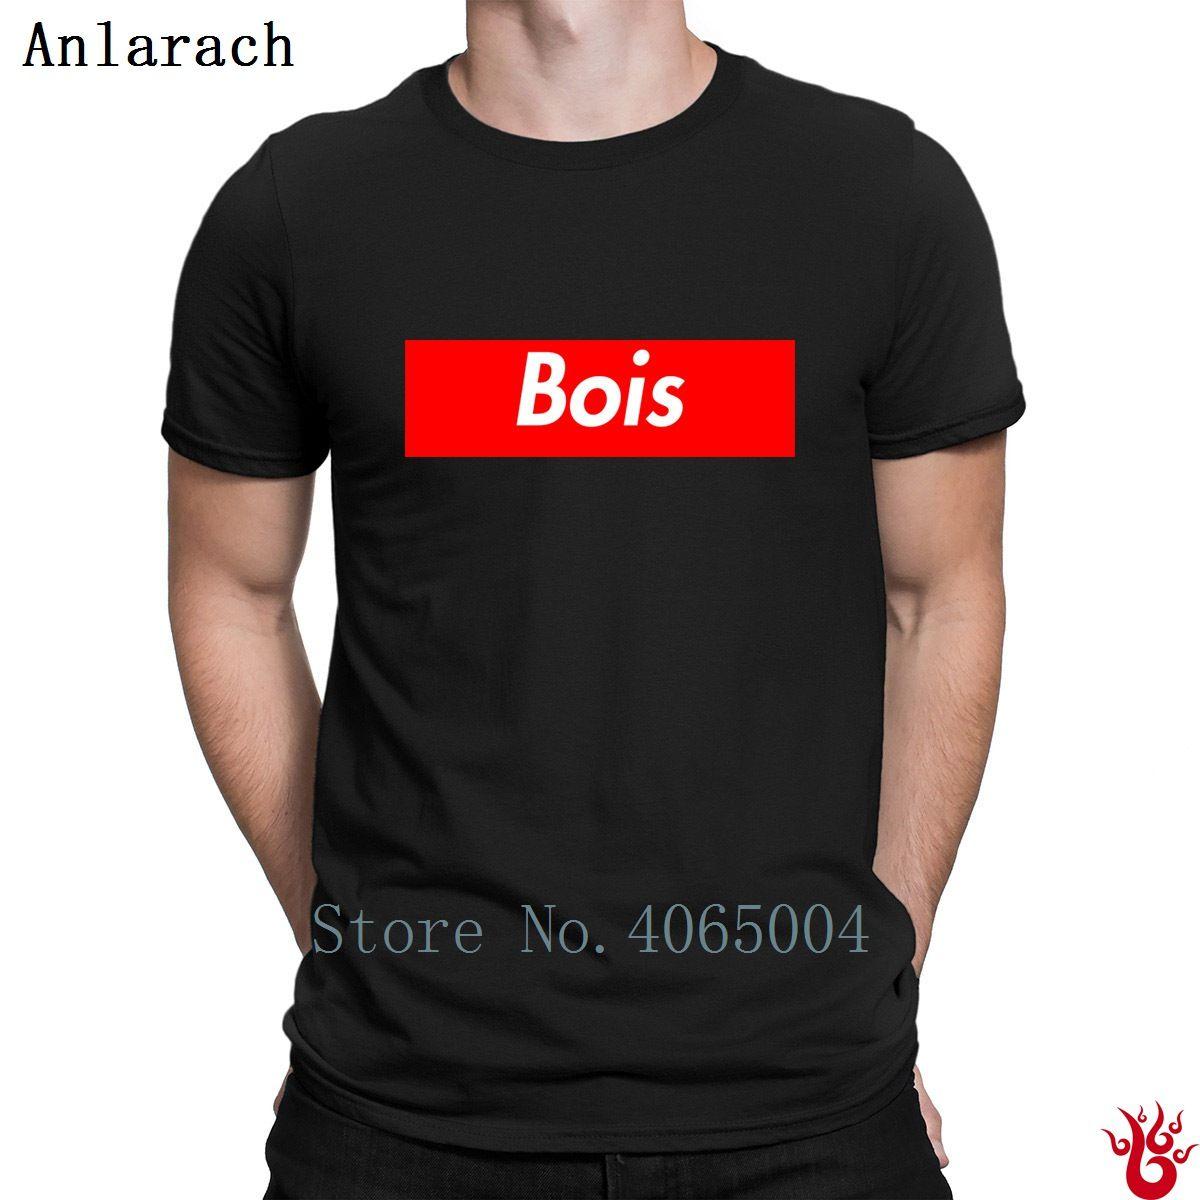 42c5810a6233 Bois Box Logo T-Shirt Family Cool O Neck 100% Cotton Men's Tshirt 2018  Basic Custom Tee Shirt Hiphop Top Gift